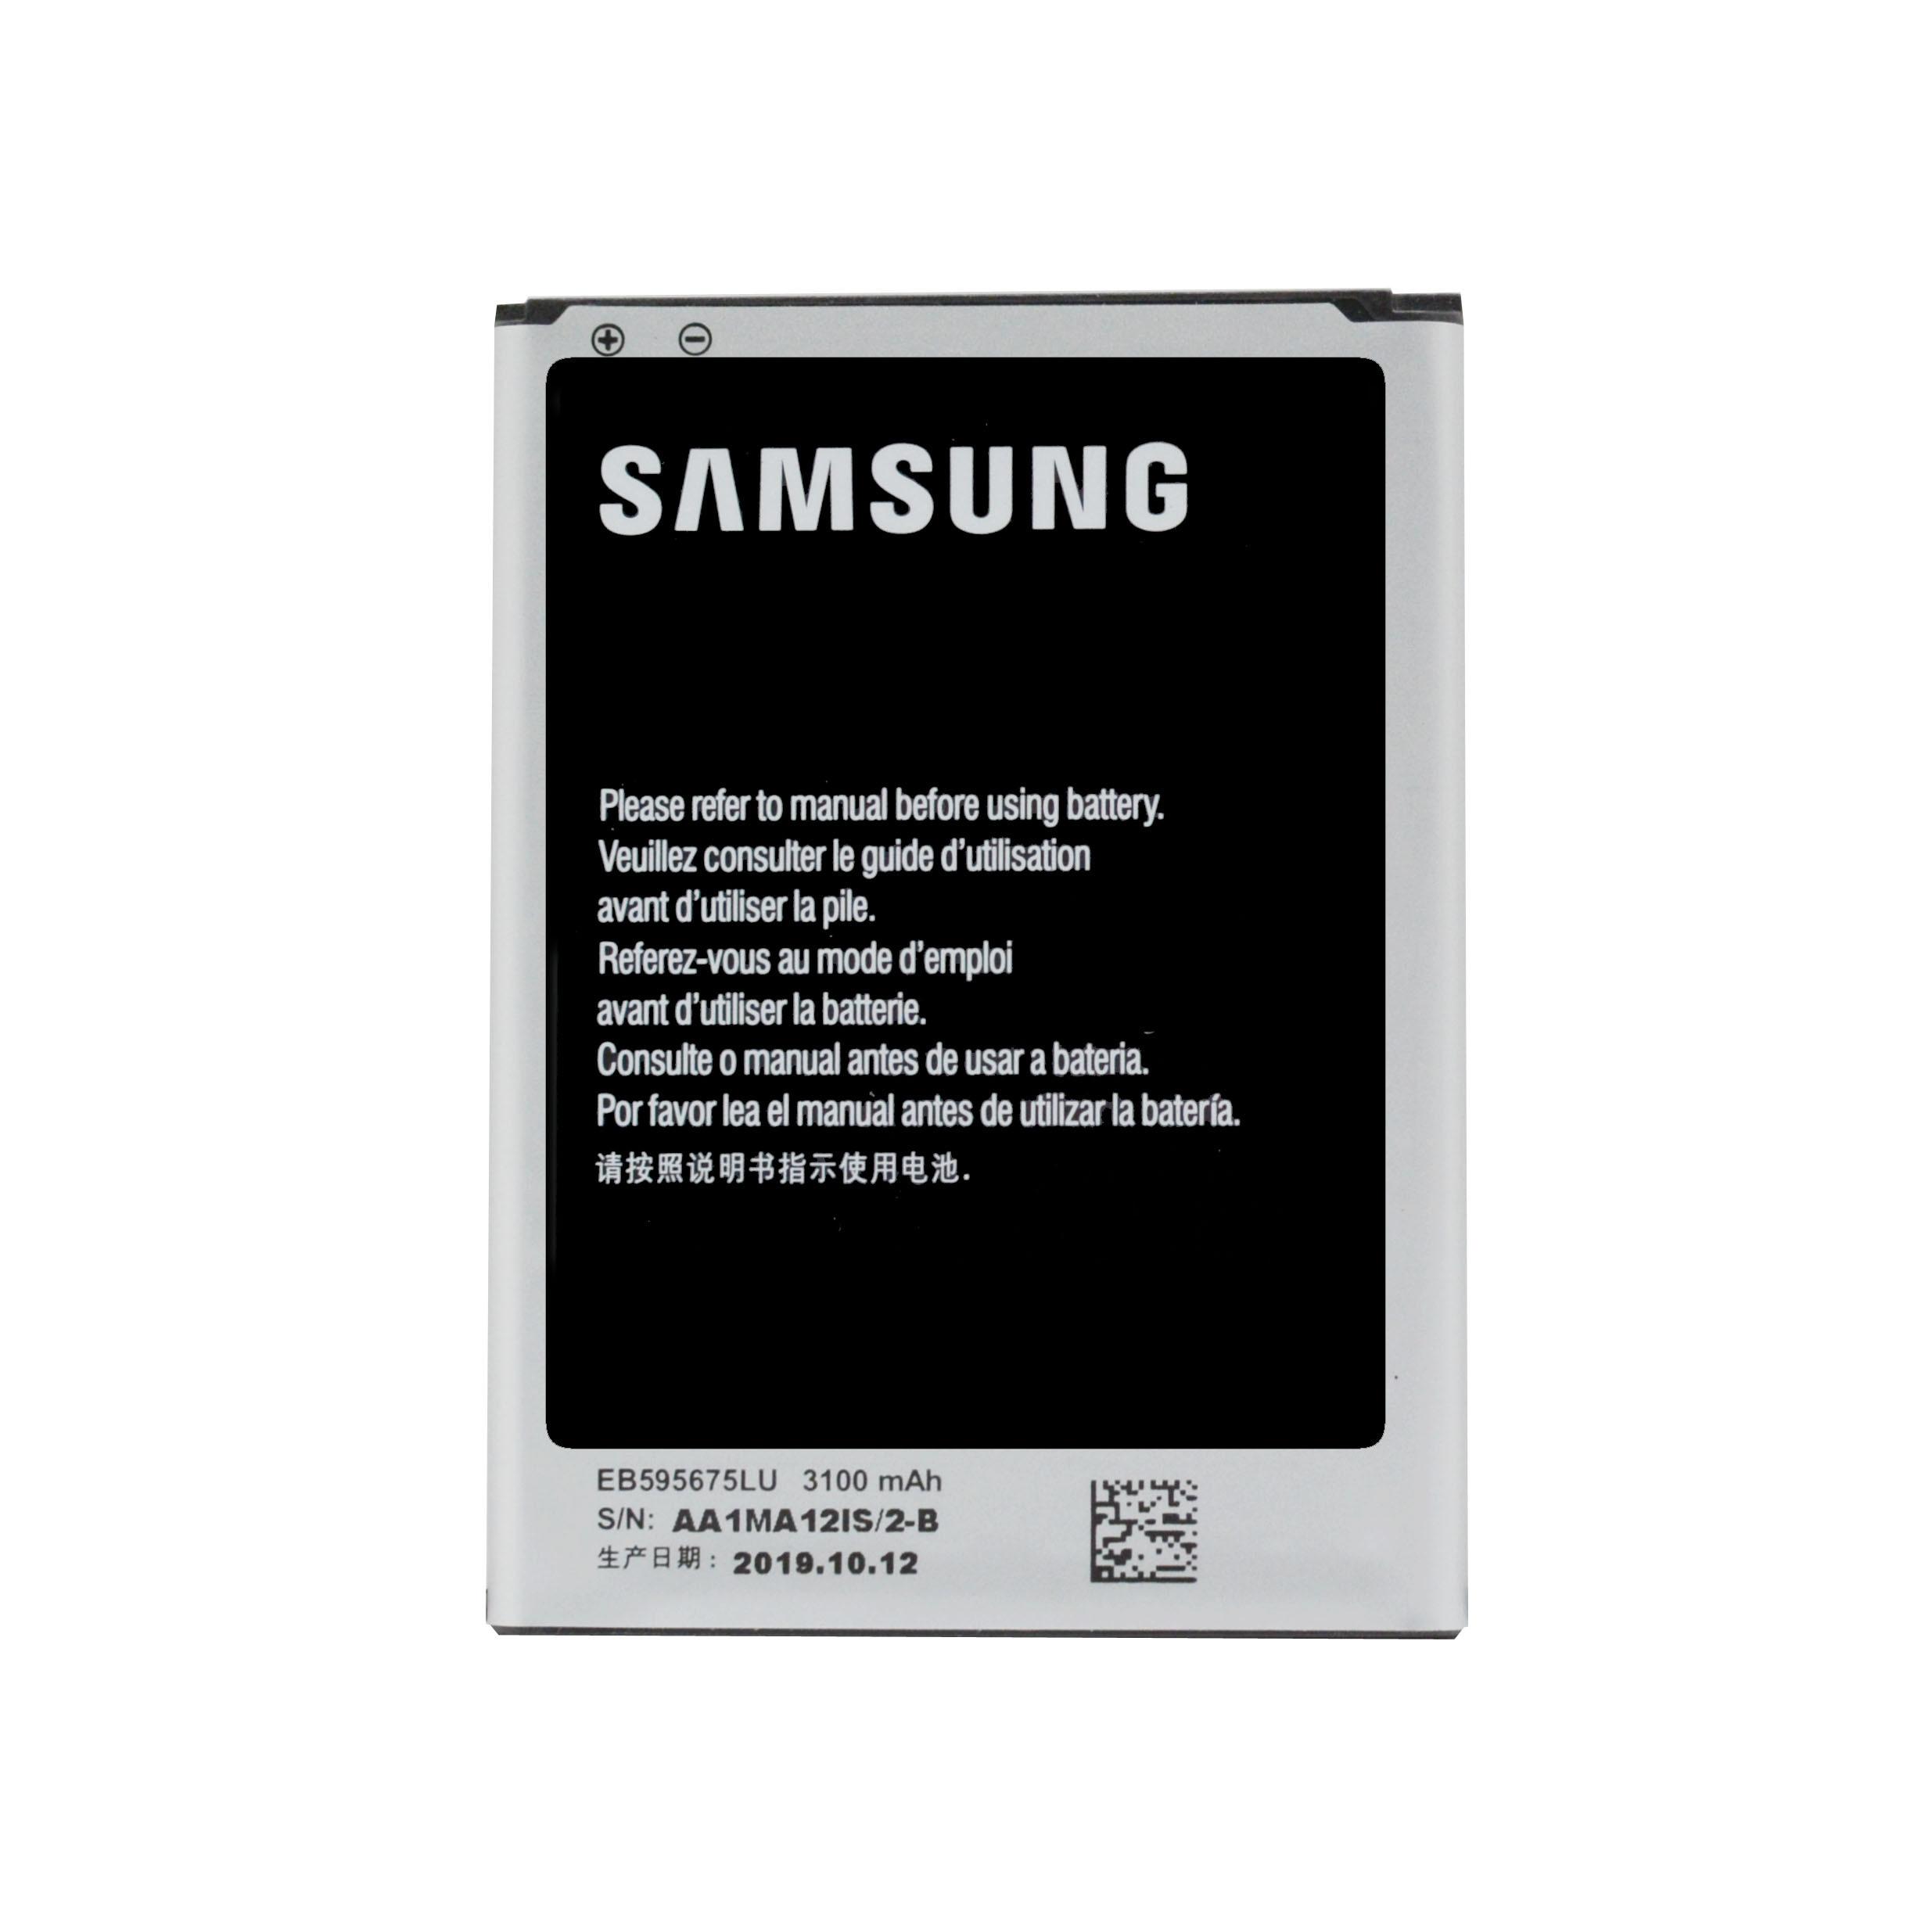 20pcs/lot High Quality Battery EB595675LU For Samsung Galaxy Note 2 N7100 N7102 N719 N7108 N7108D Phone Bateria AKKU 3100mAh enlarge